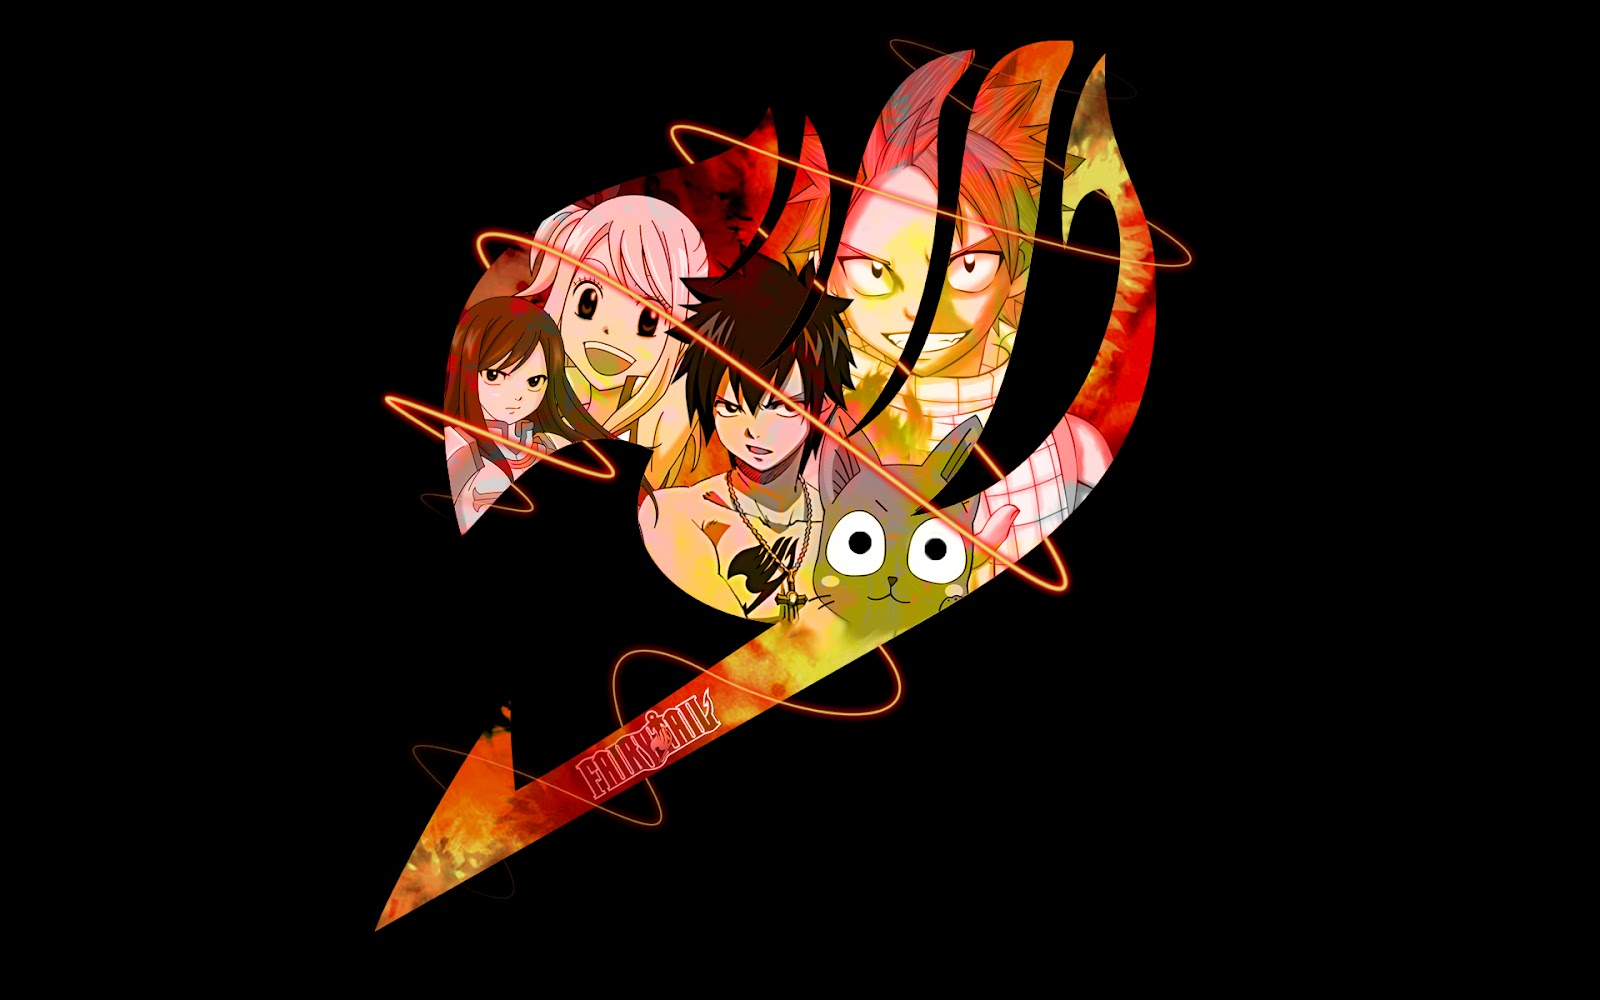 http://4.bp.blogspot.com/-YGLBk2YIIA4/UAywzURlRzI/AAAAAAAAAKk/QIqcHfEa_F0/s1600/fairy_tail_wallpaper_by_ykade.jpg